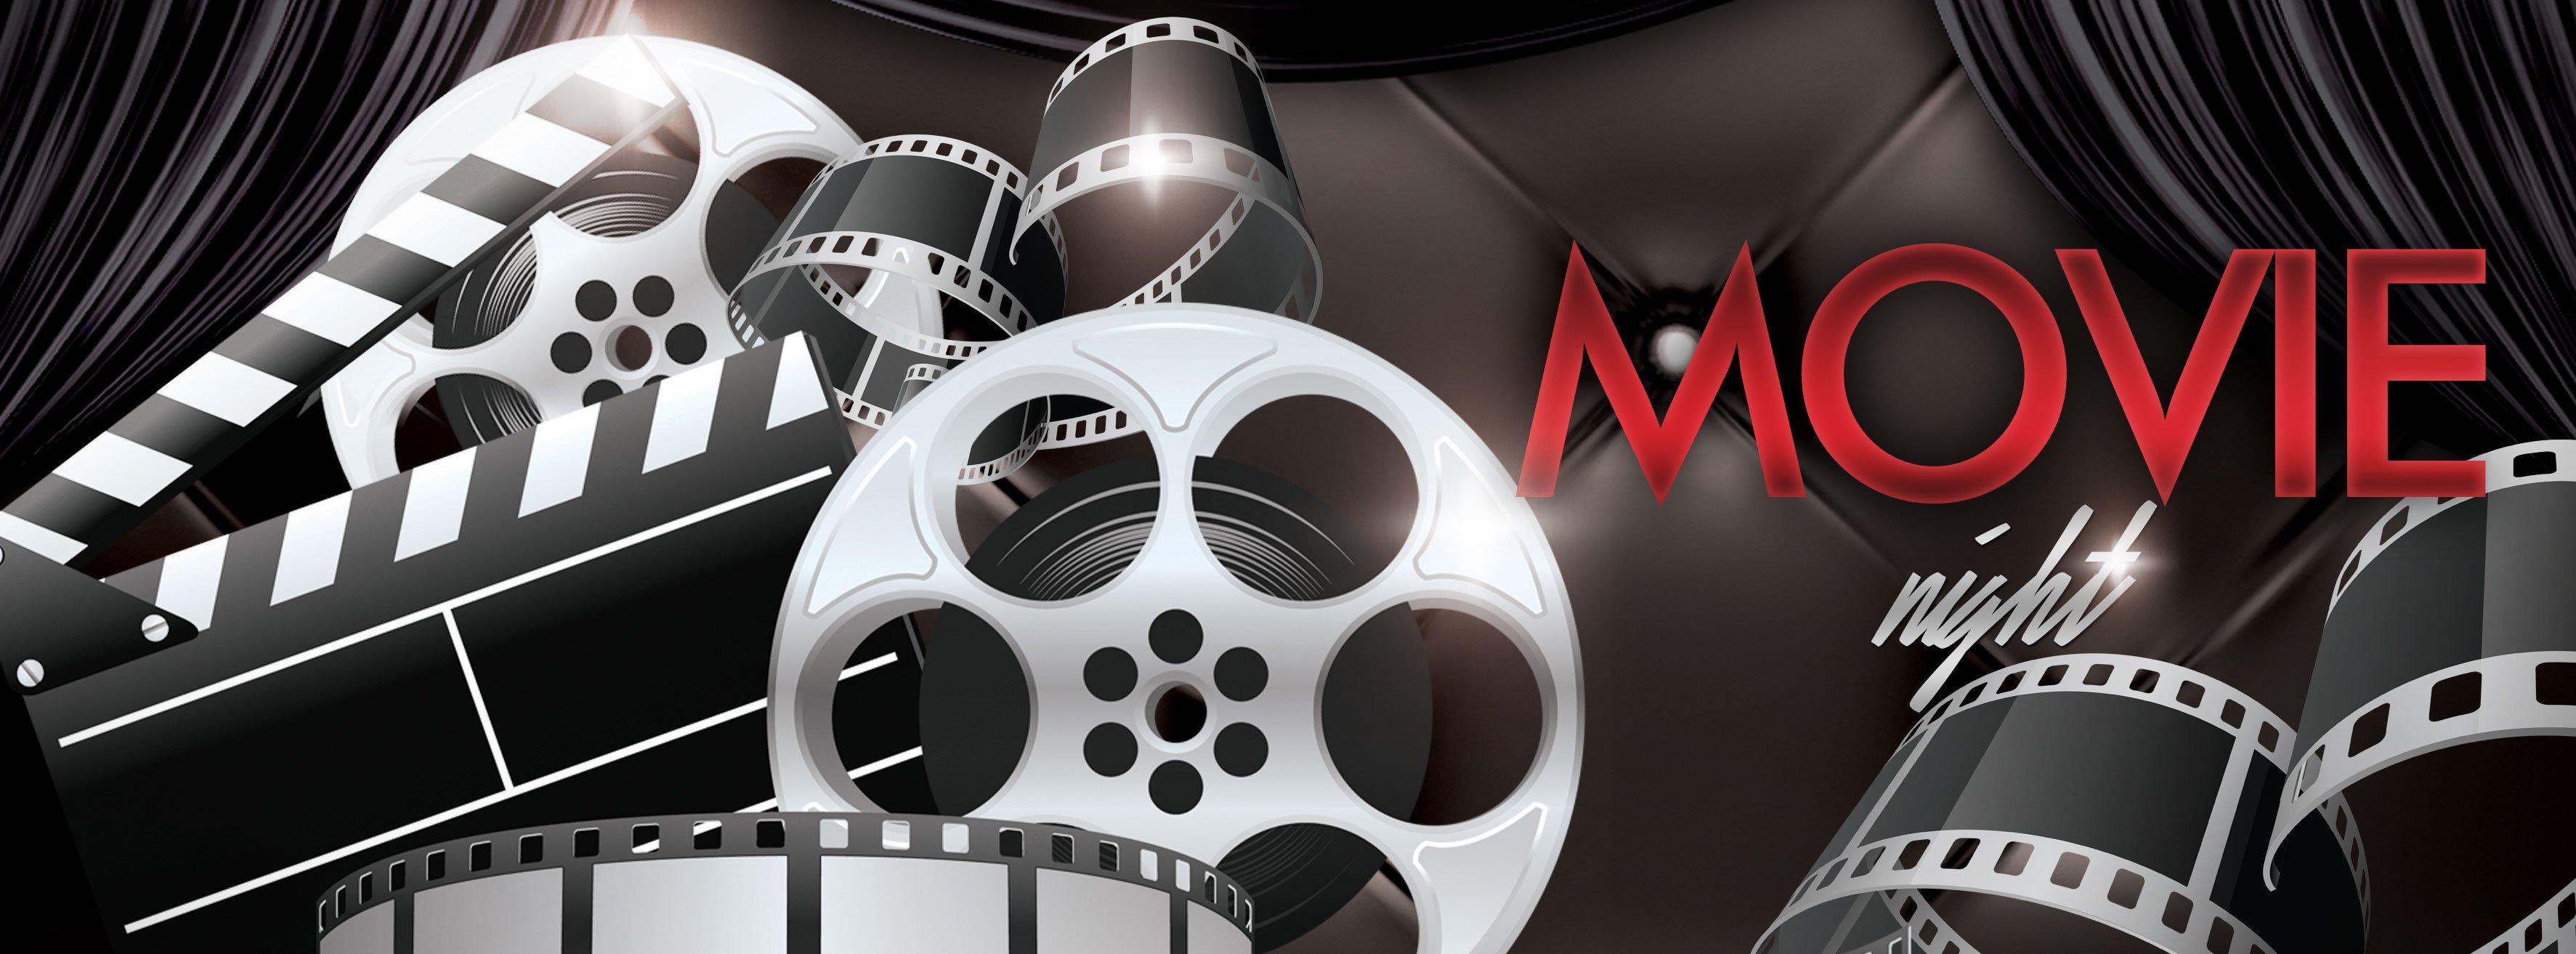 Movie Night PSD Flyer Template 7583 Styleflyers – Movie Night Flyer Template